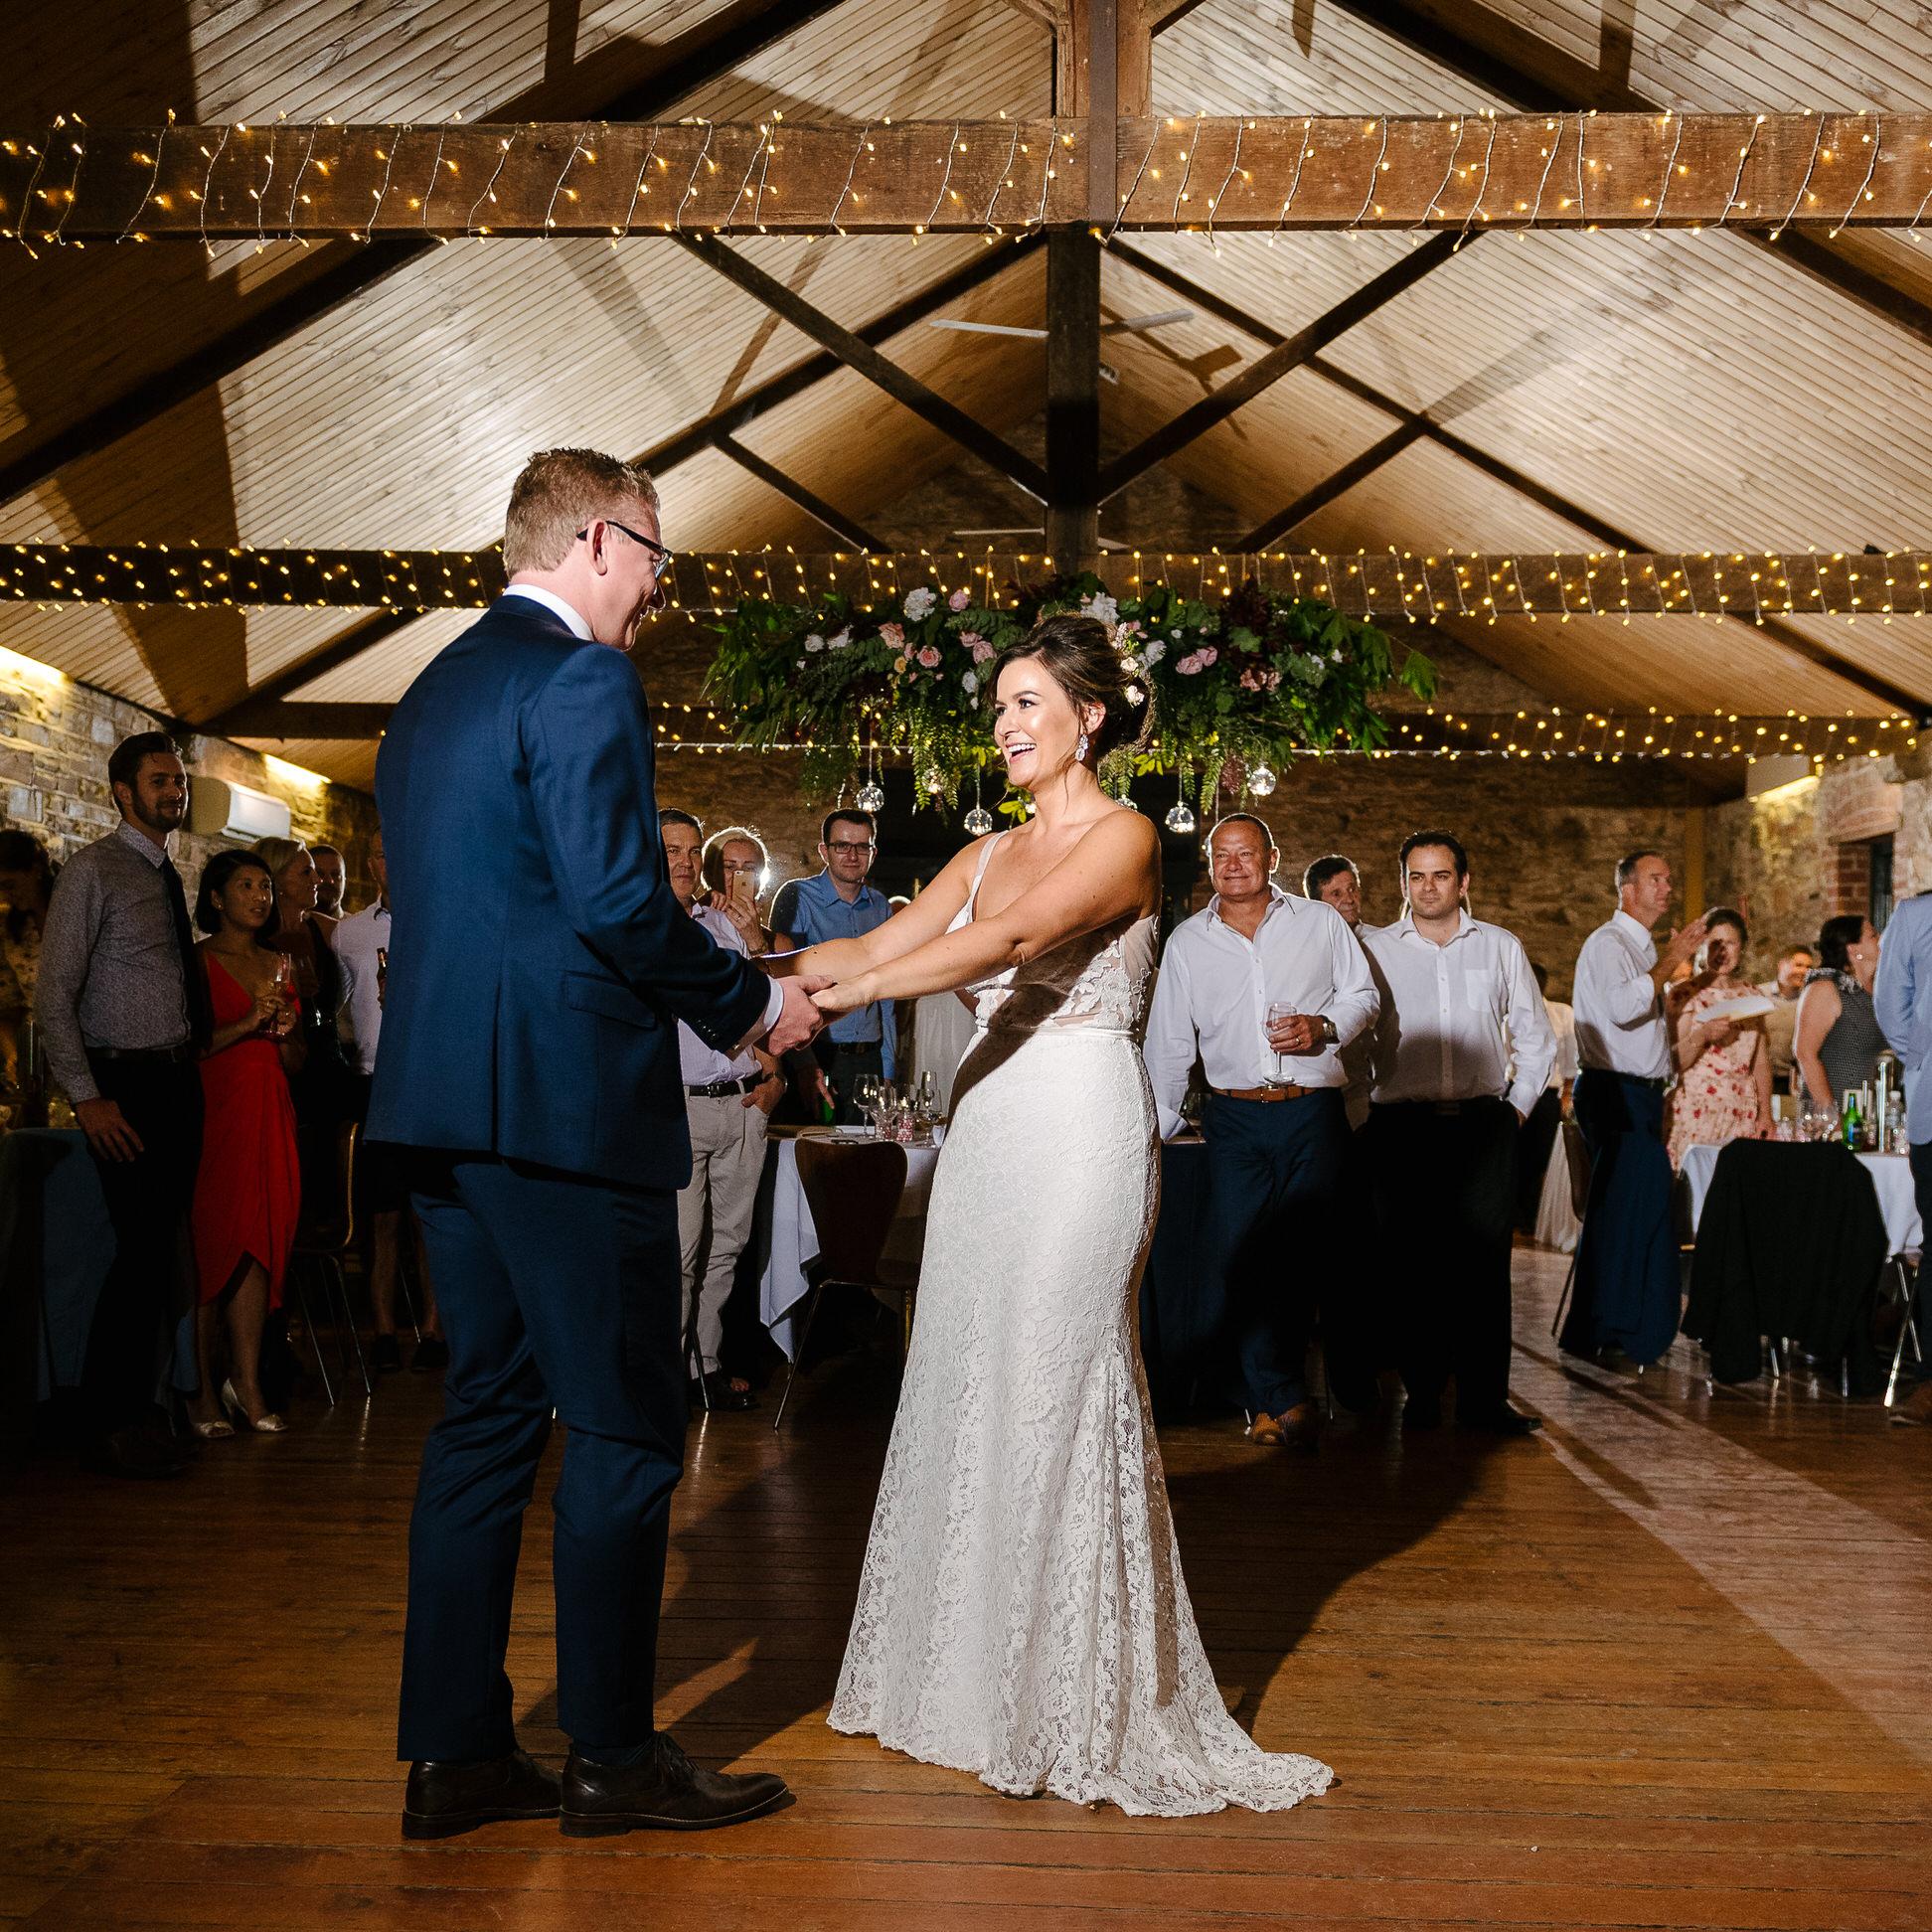 Justin_And_Jim_Photography_Chateau_Dore_Bendigo_Wedding95.JPG